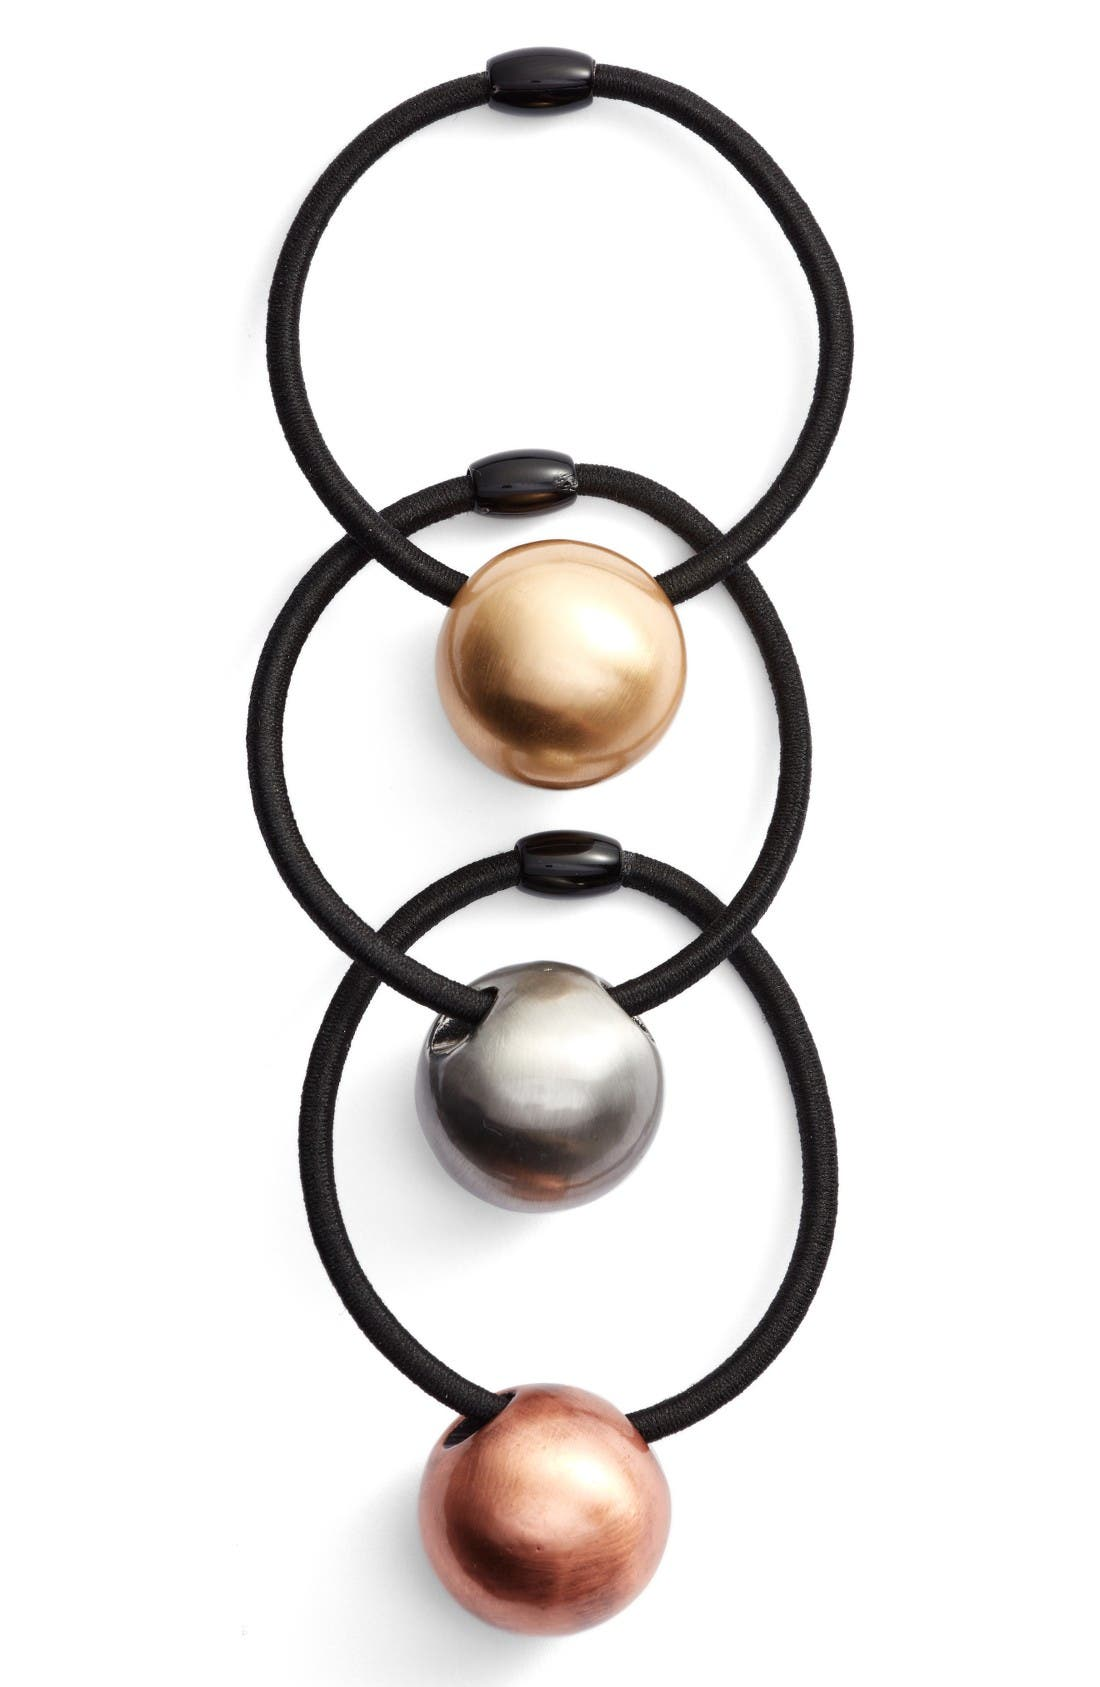 Alternate Image 1 Selected - Tasha 3-Pack Ball Charm Ponytail Holders